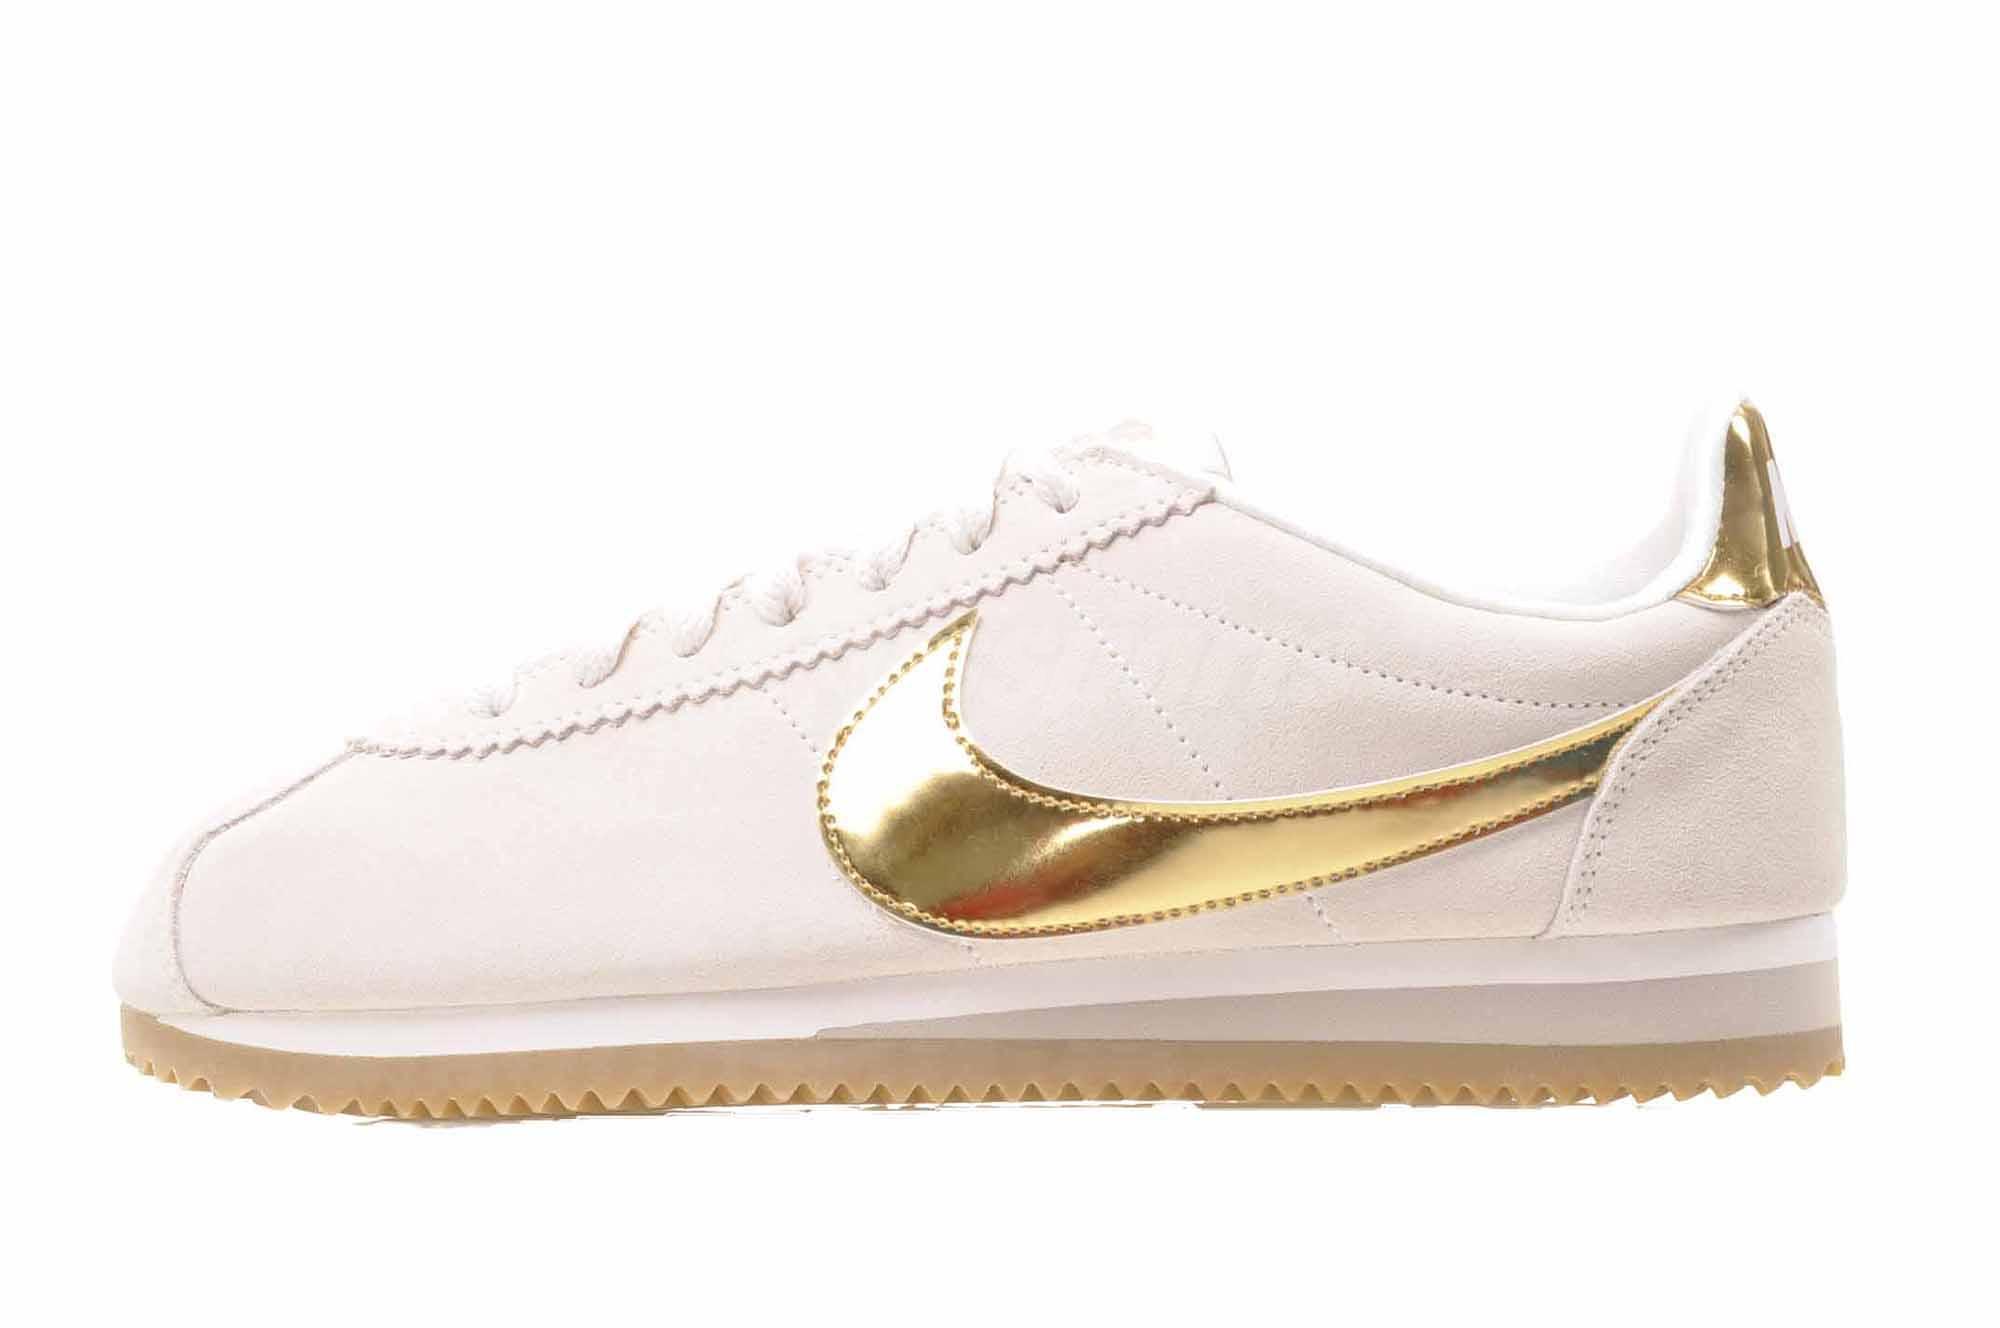 b31ad47c8b2 Nike Wmns Classic Cortez SE Casual Womens Shoes Sneakers Phantom 902856-013